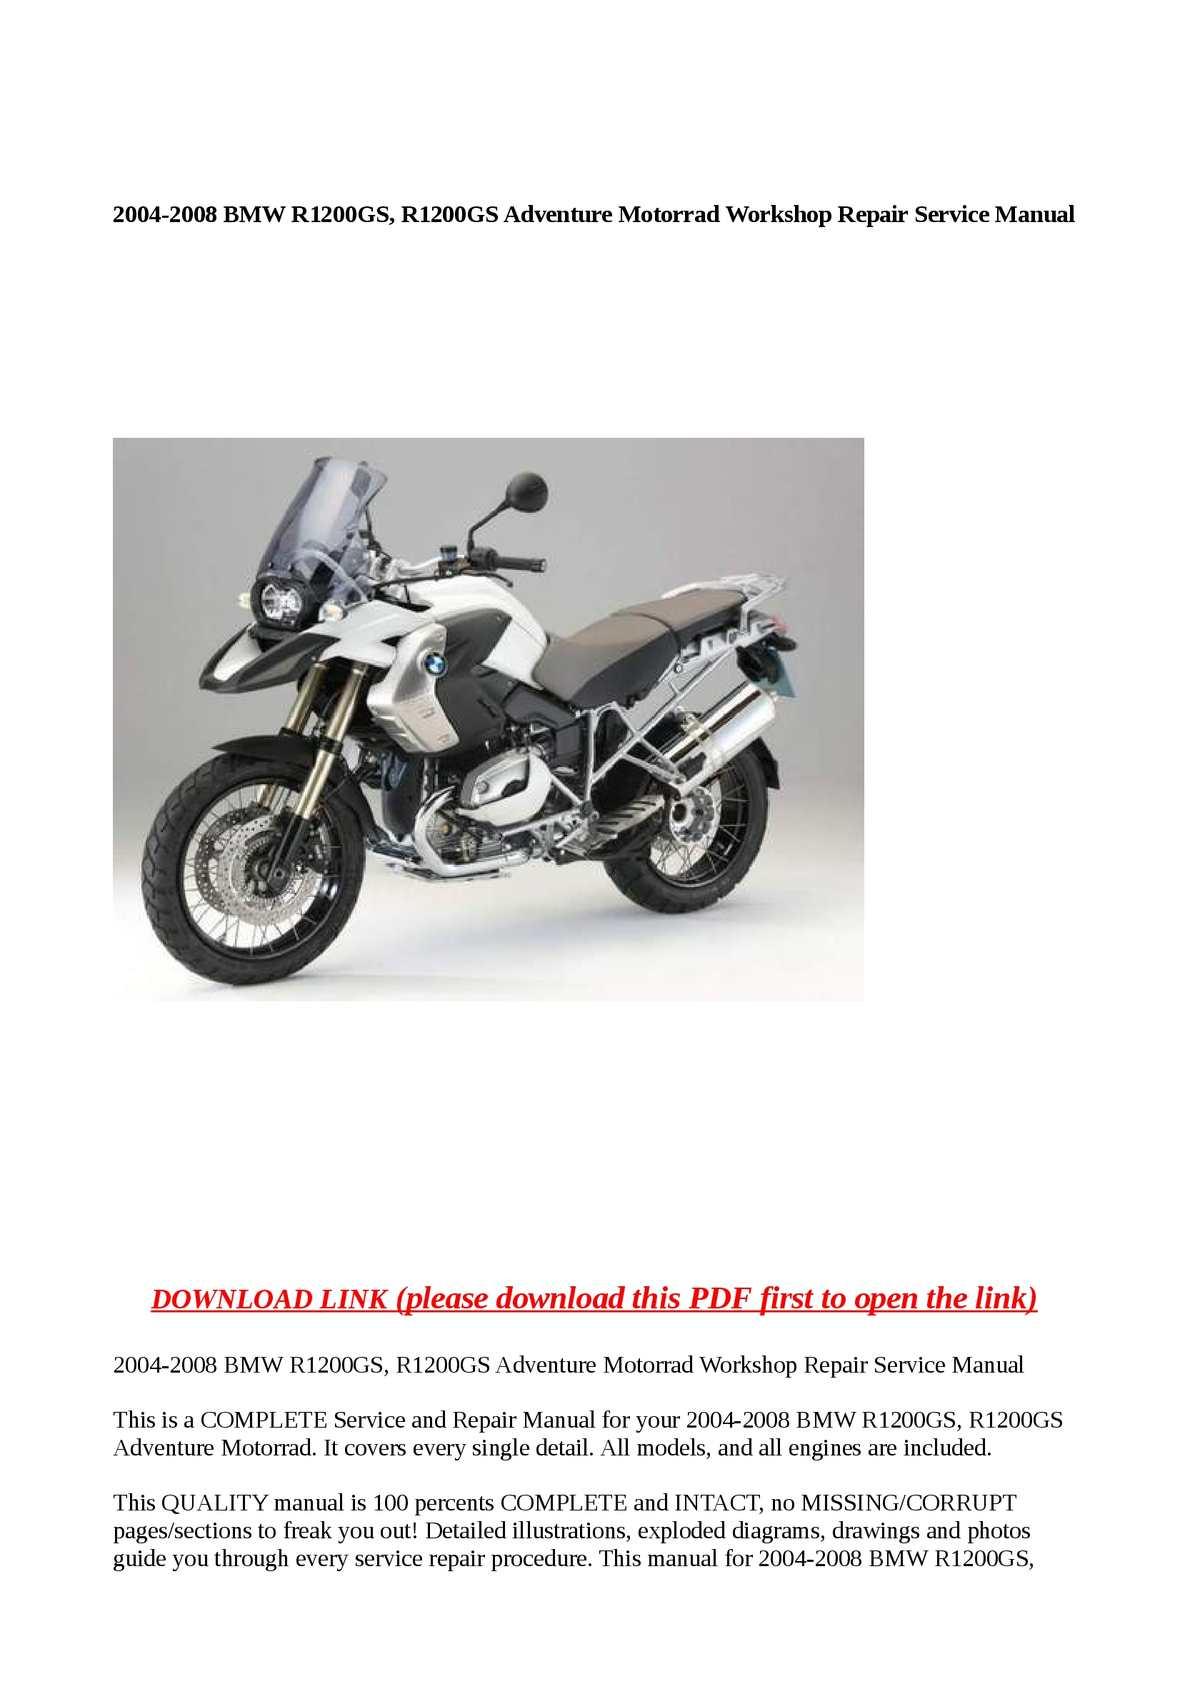 calam o 2004 2008 bmw r1200gs r1200gs adventure motorrad workshop rh  calameo com r1200gs manual 2016 r1200gs manual free download